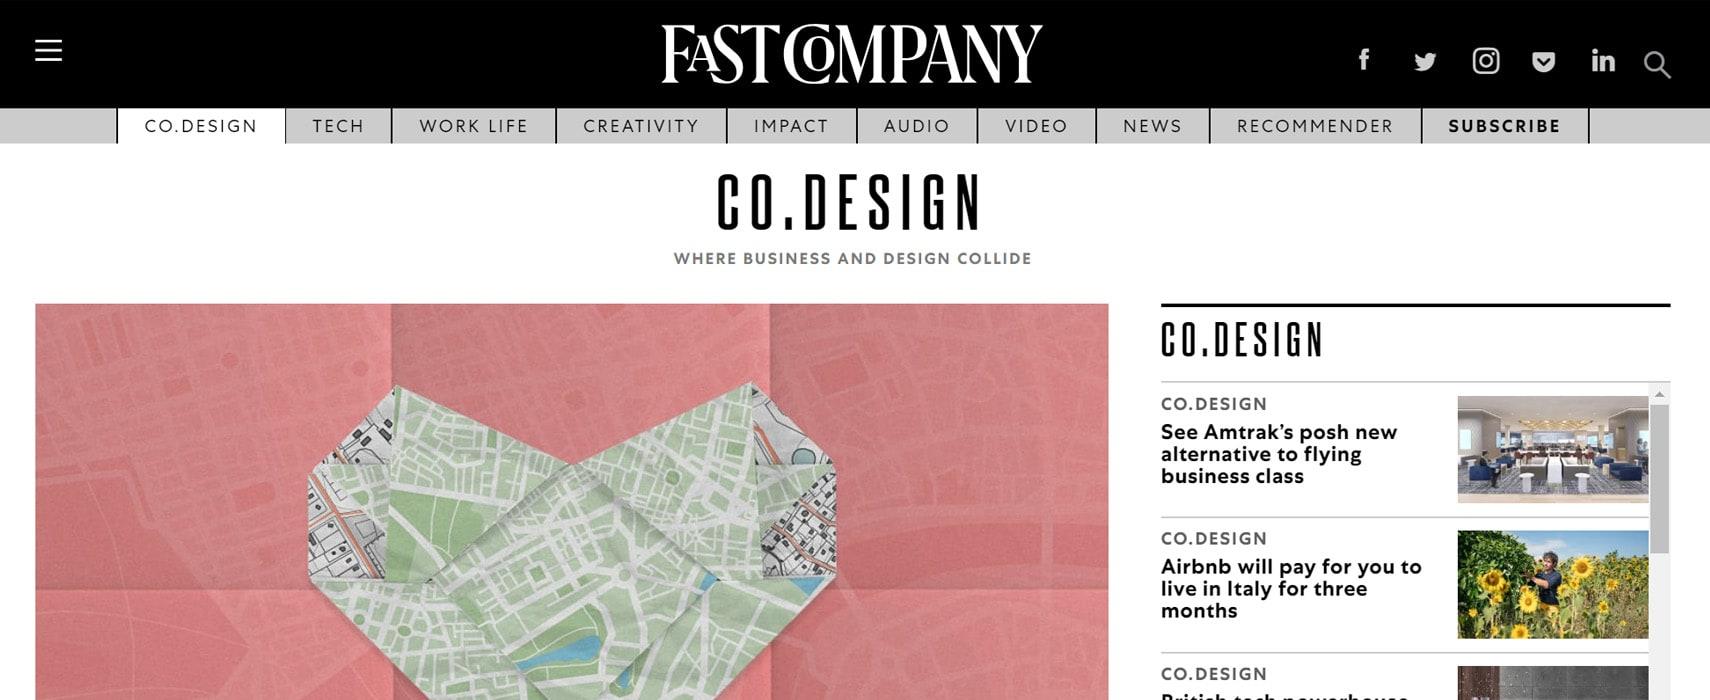 Fast Company Design Blog